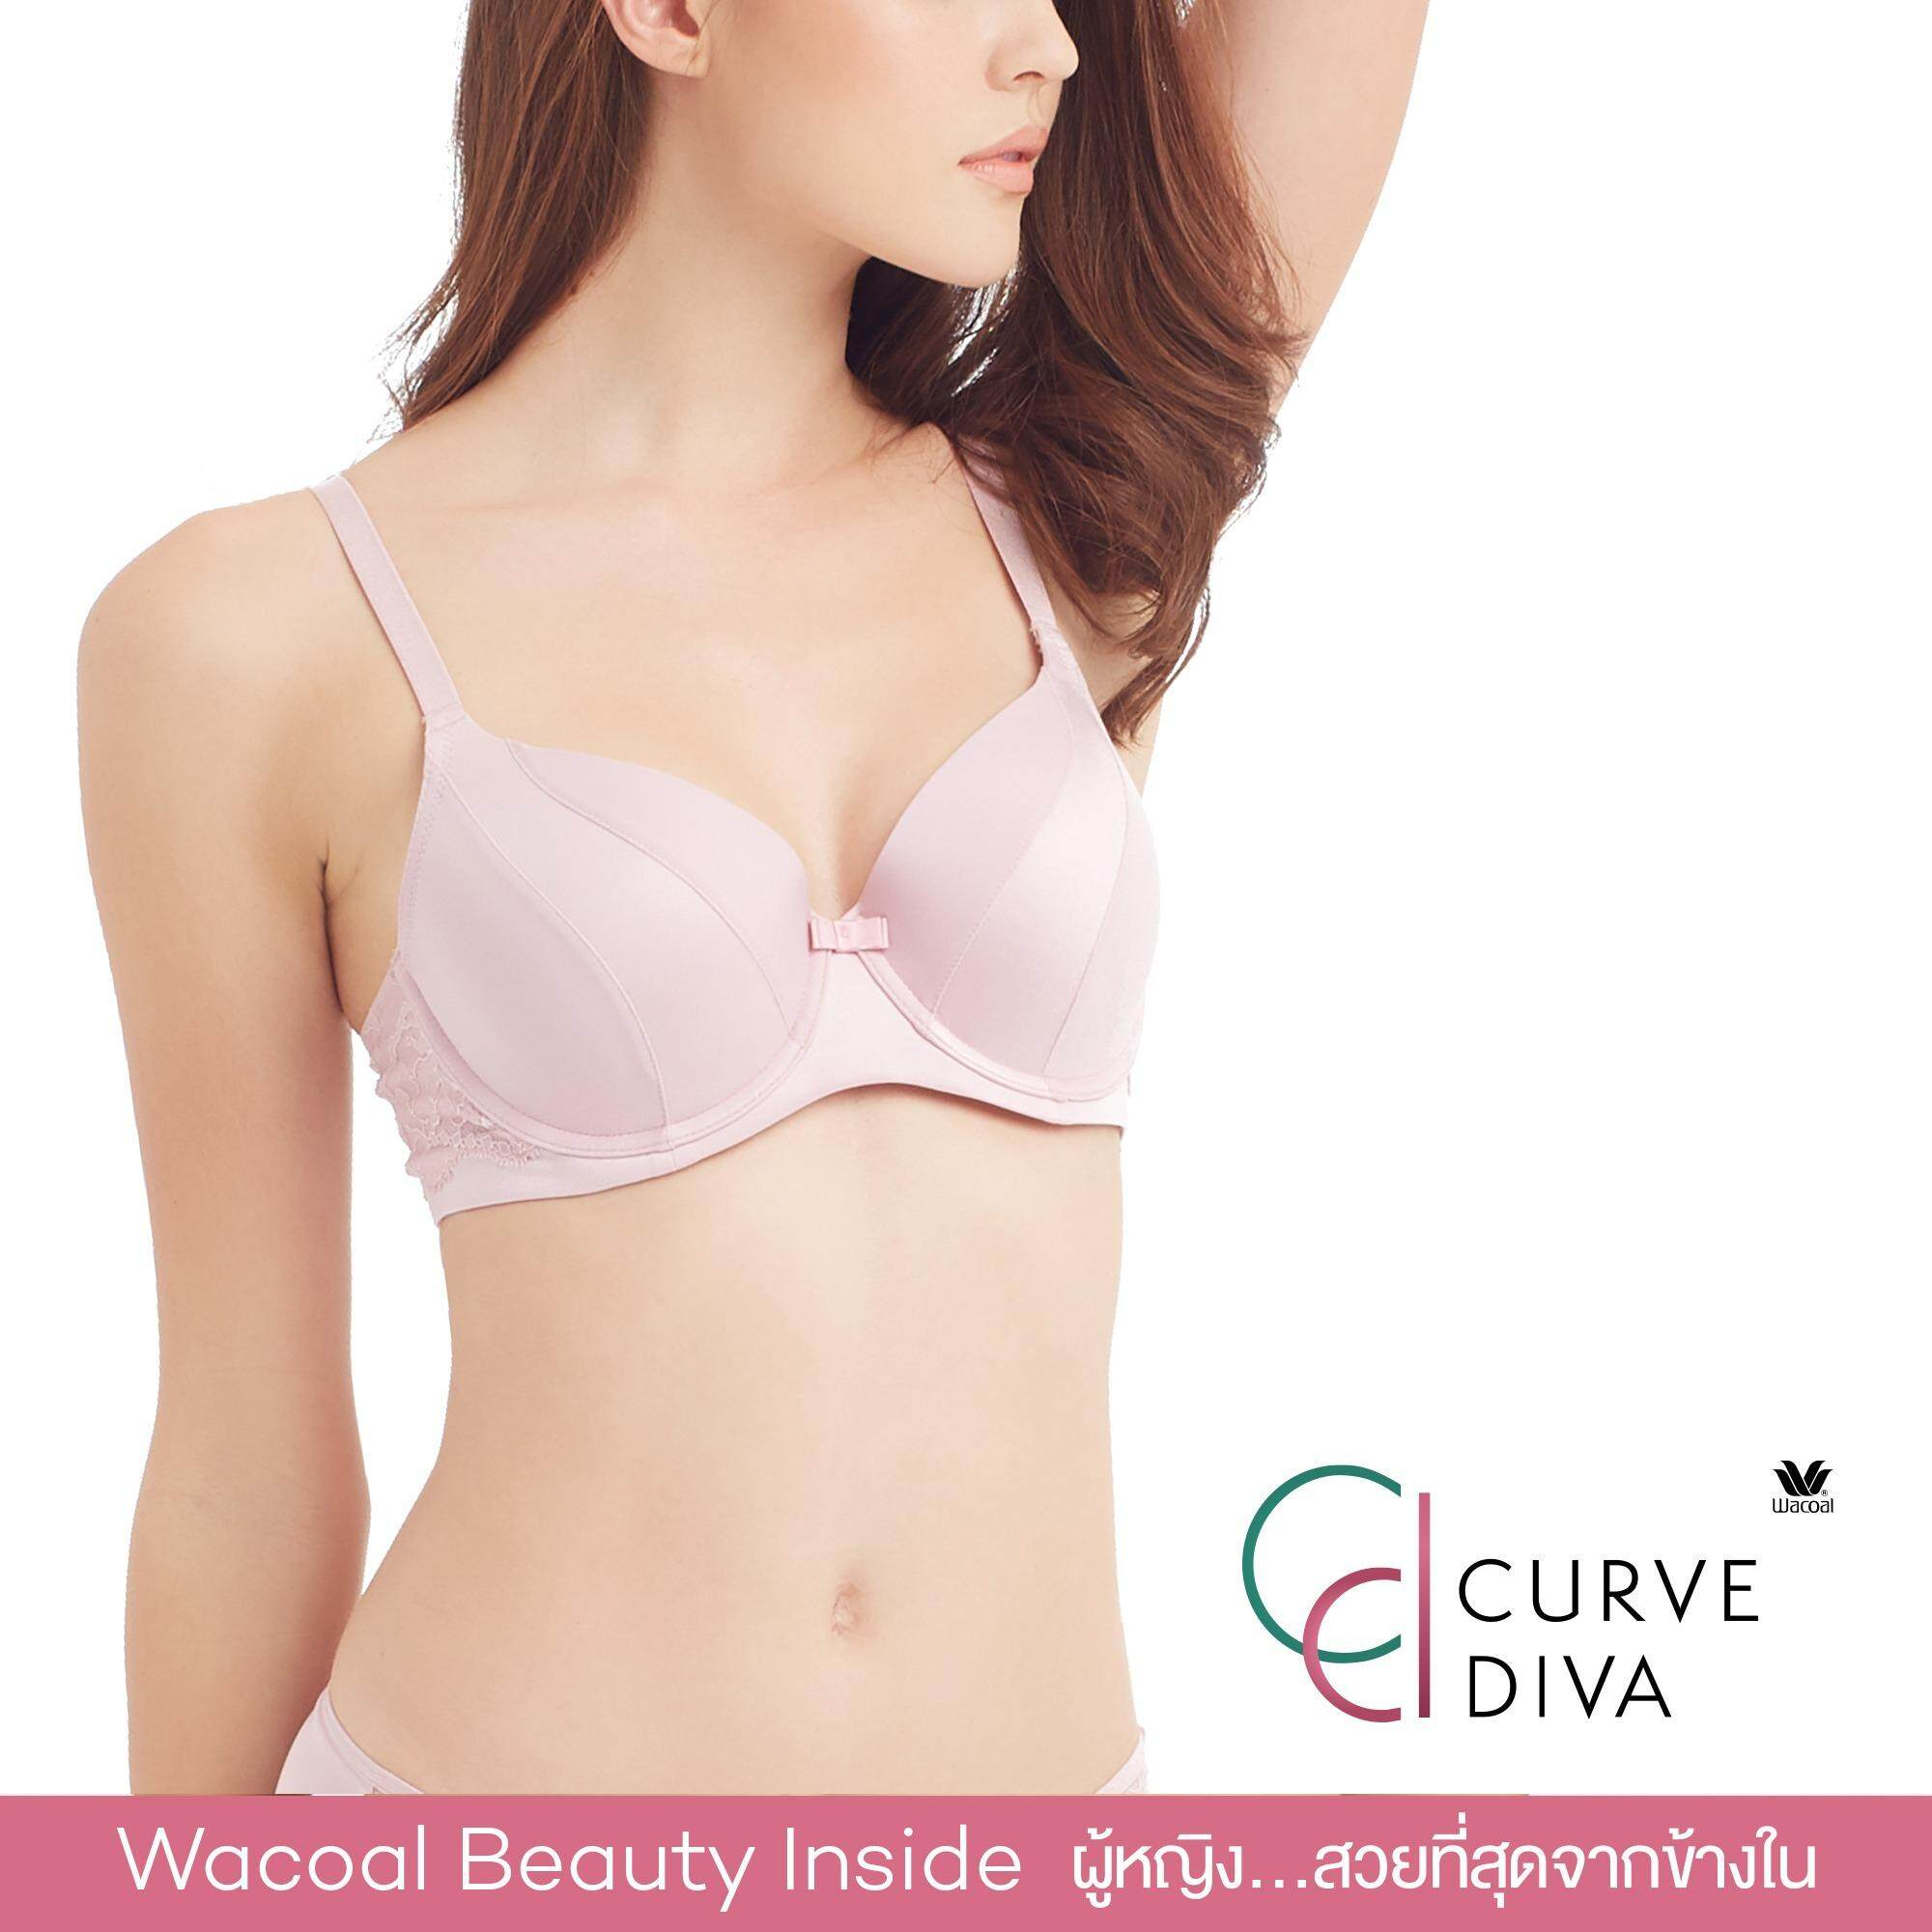 Wacoal Curve Diva Seamless bra 4/5 Cup (สีชมพูกุหลาบป่า/WILD ROSE) - WB7942WR